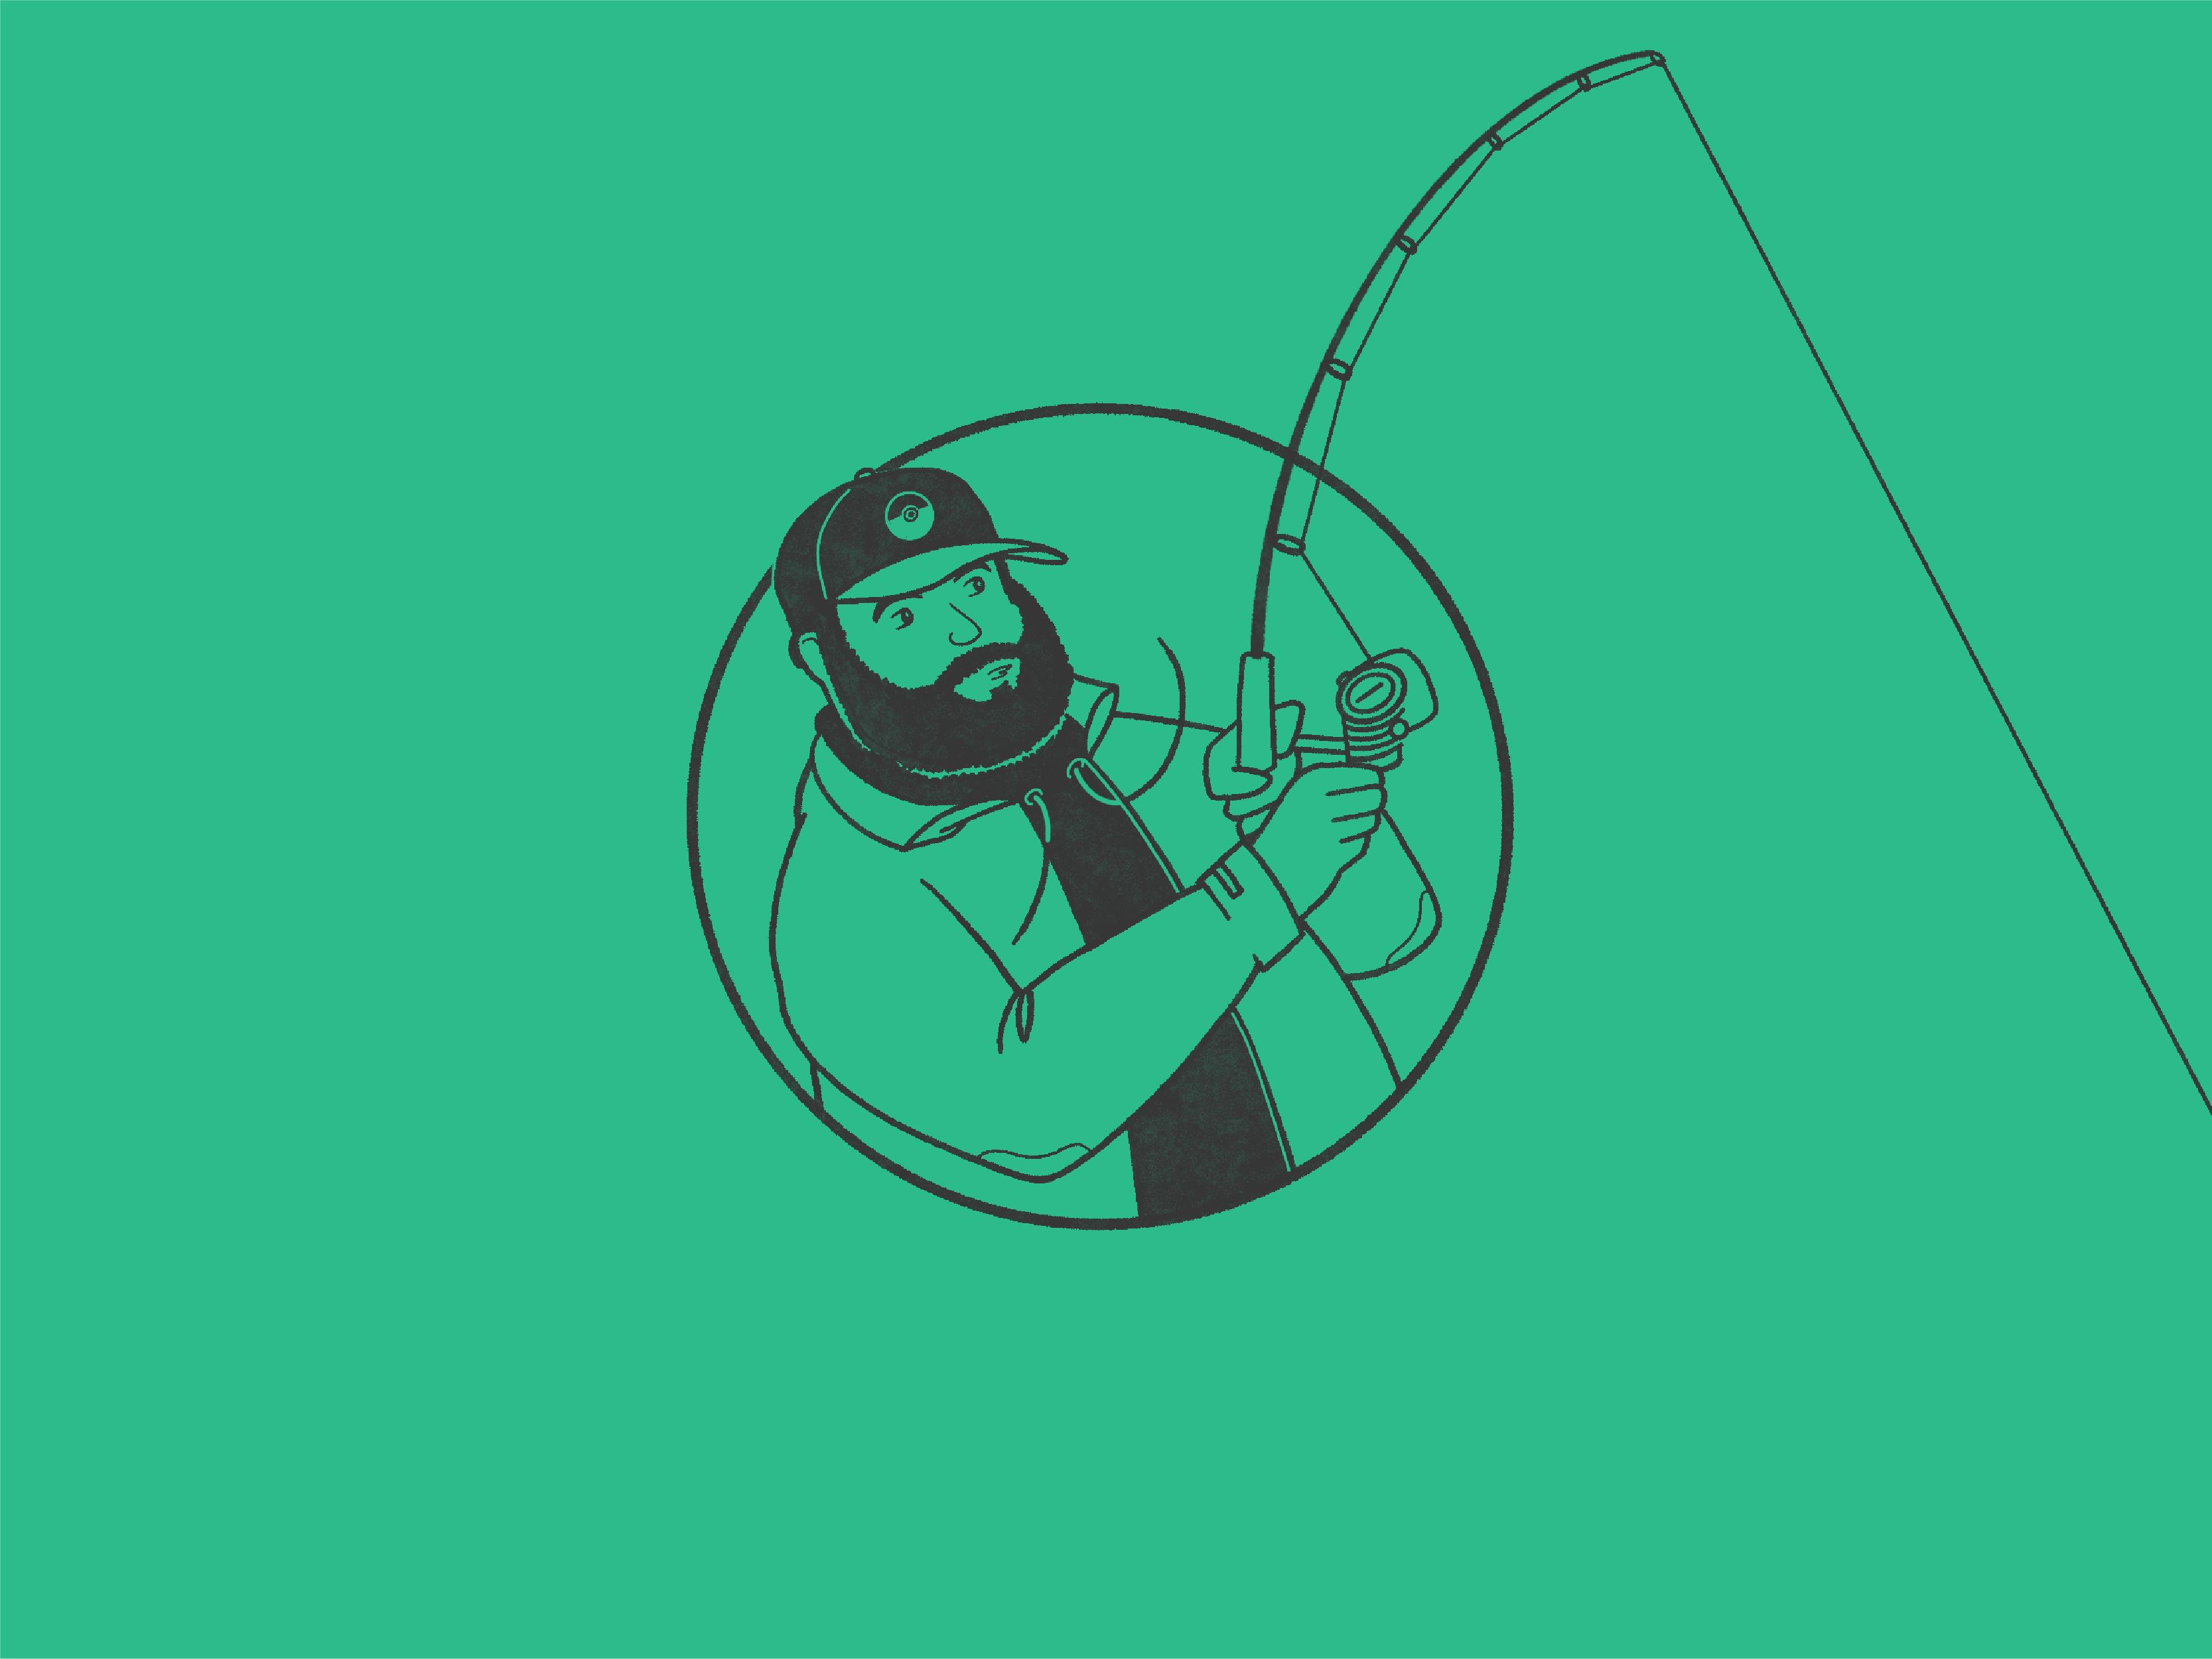 illustration of greg fishing for greg baan .com